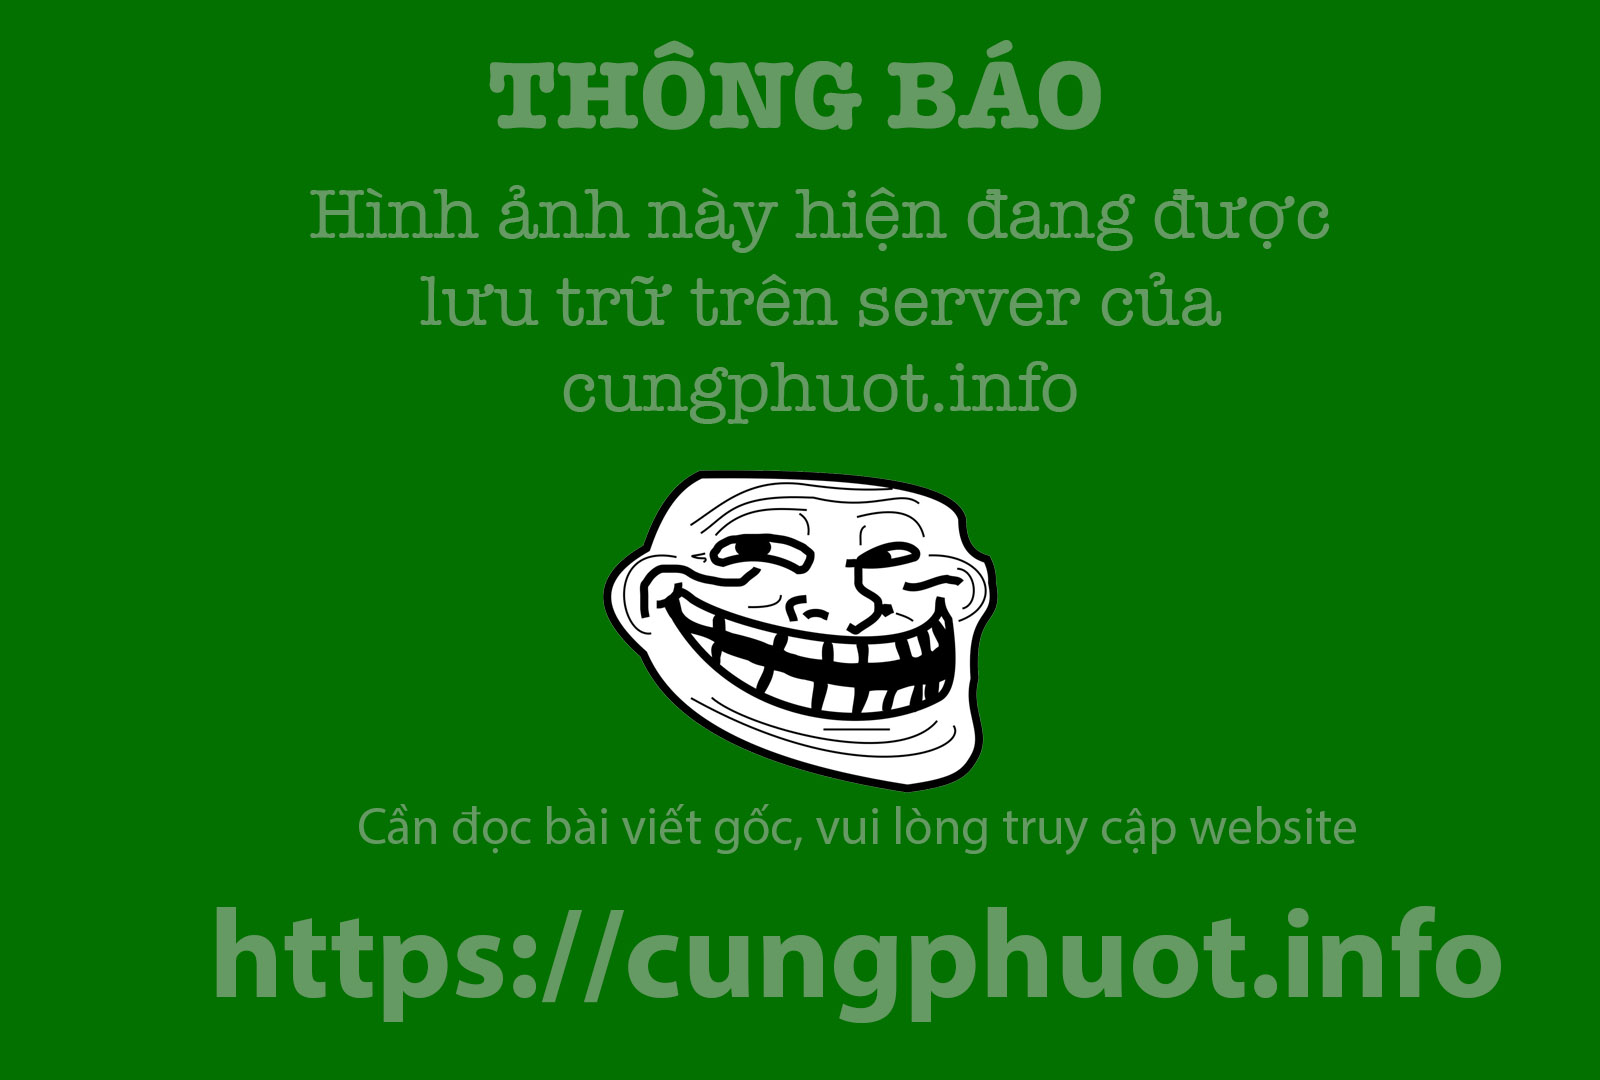 Motorcycle Rental Quy Nhon, Binh Dinh